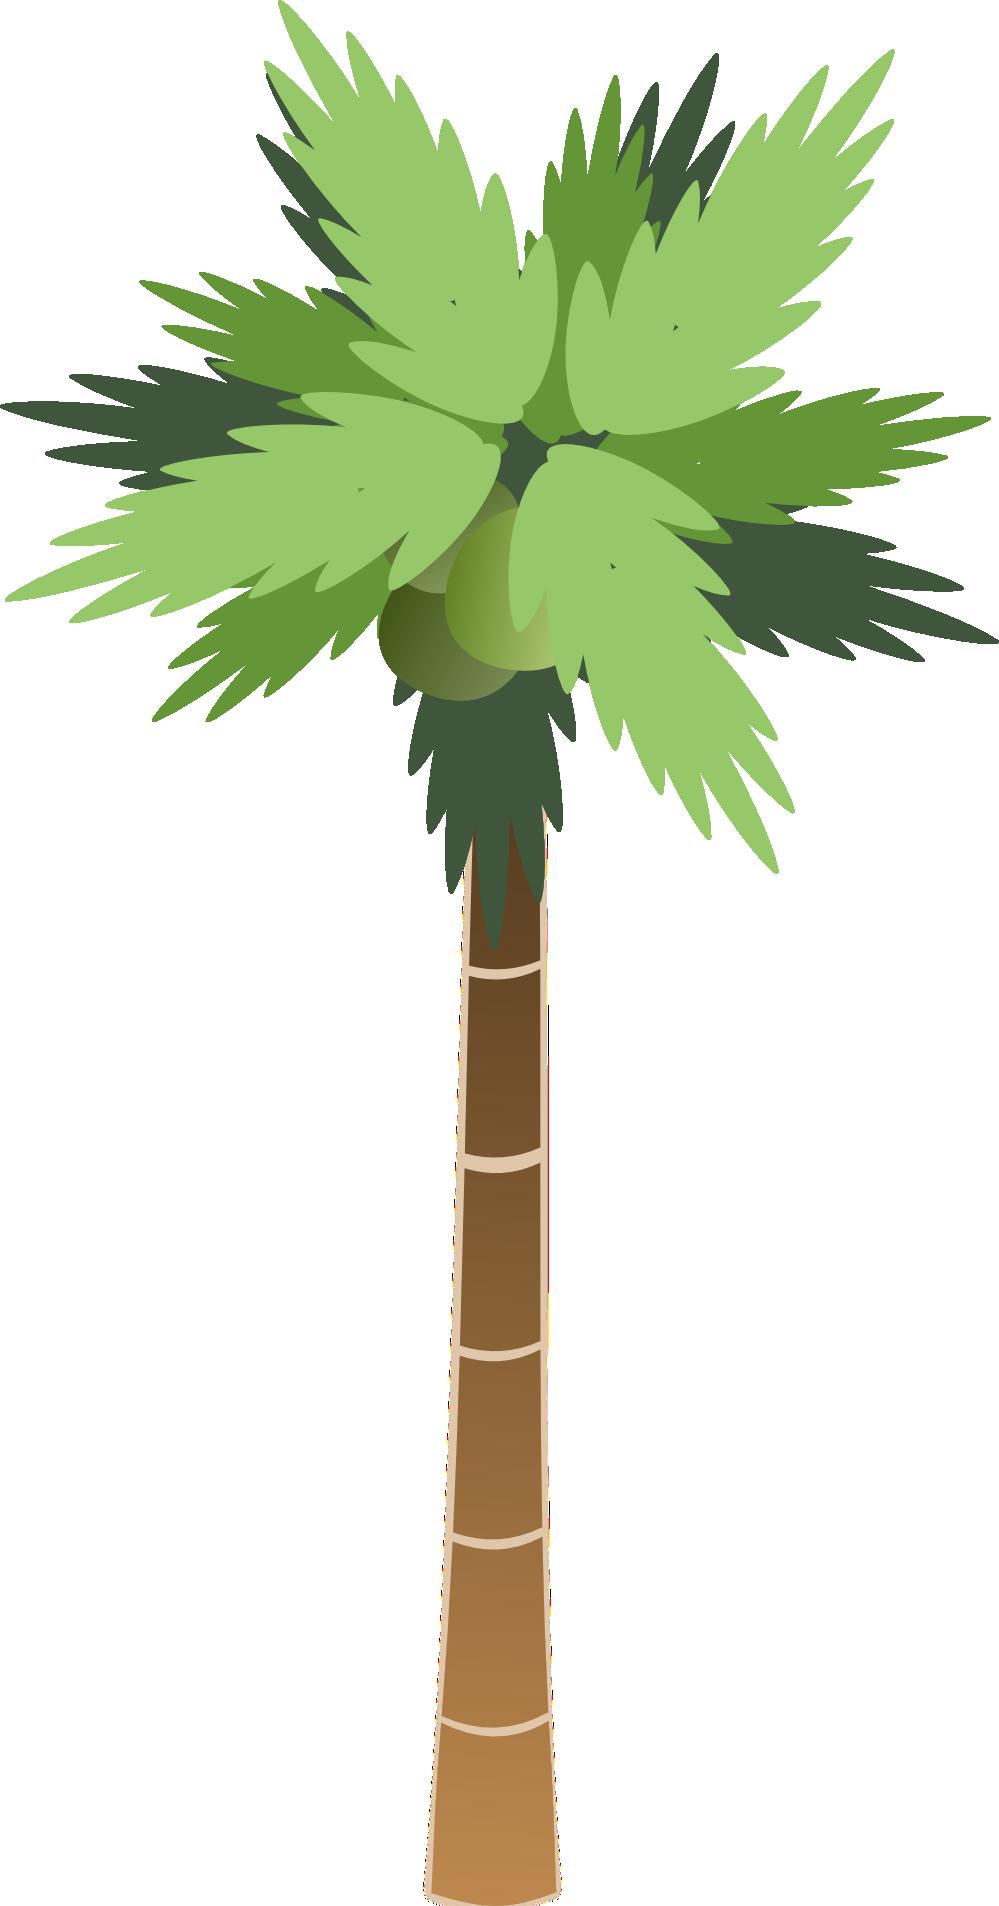 Qcbayqagi Png 999 1906 Palm Tree Clip Art Palm Tree Png Coconut Palm Tree